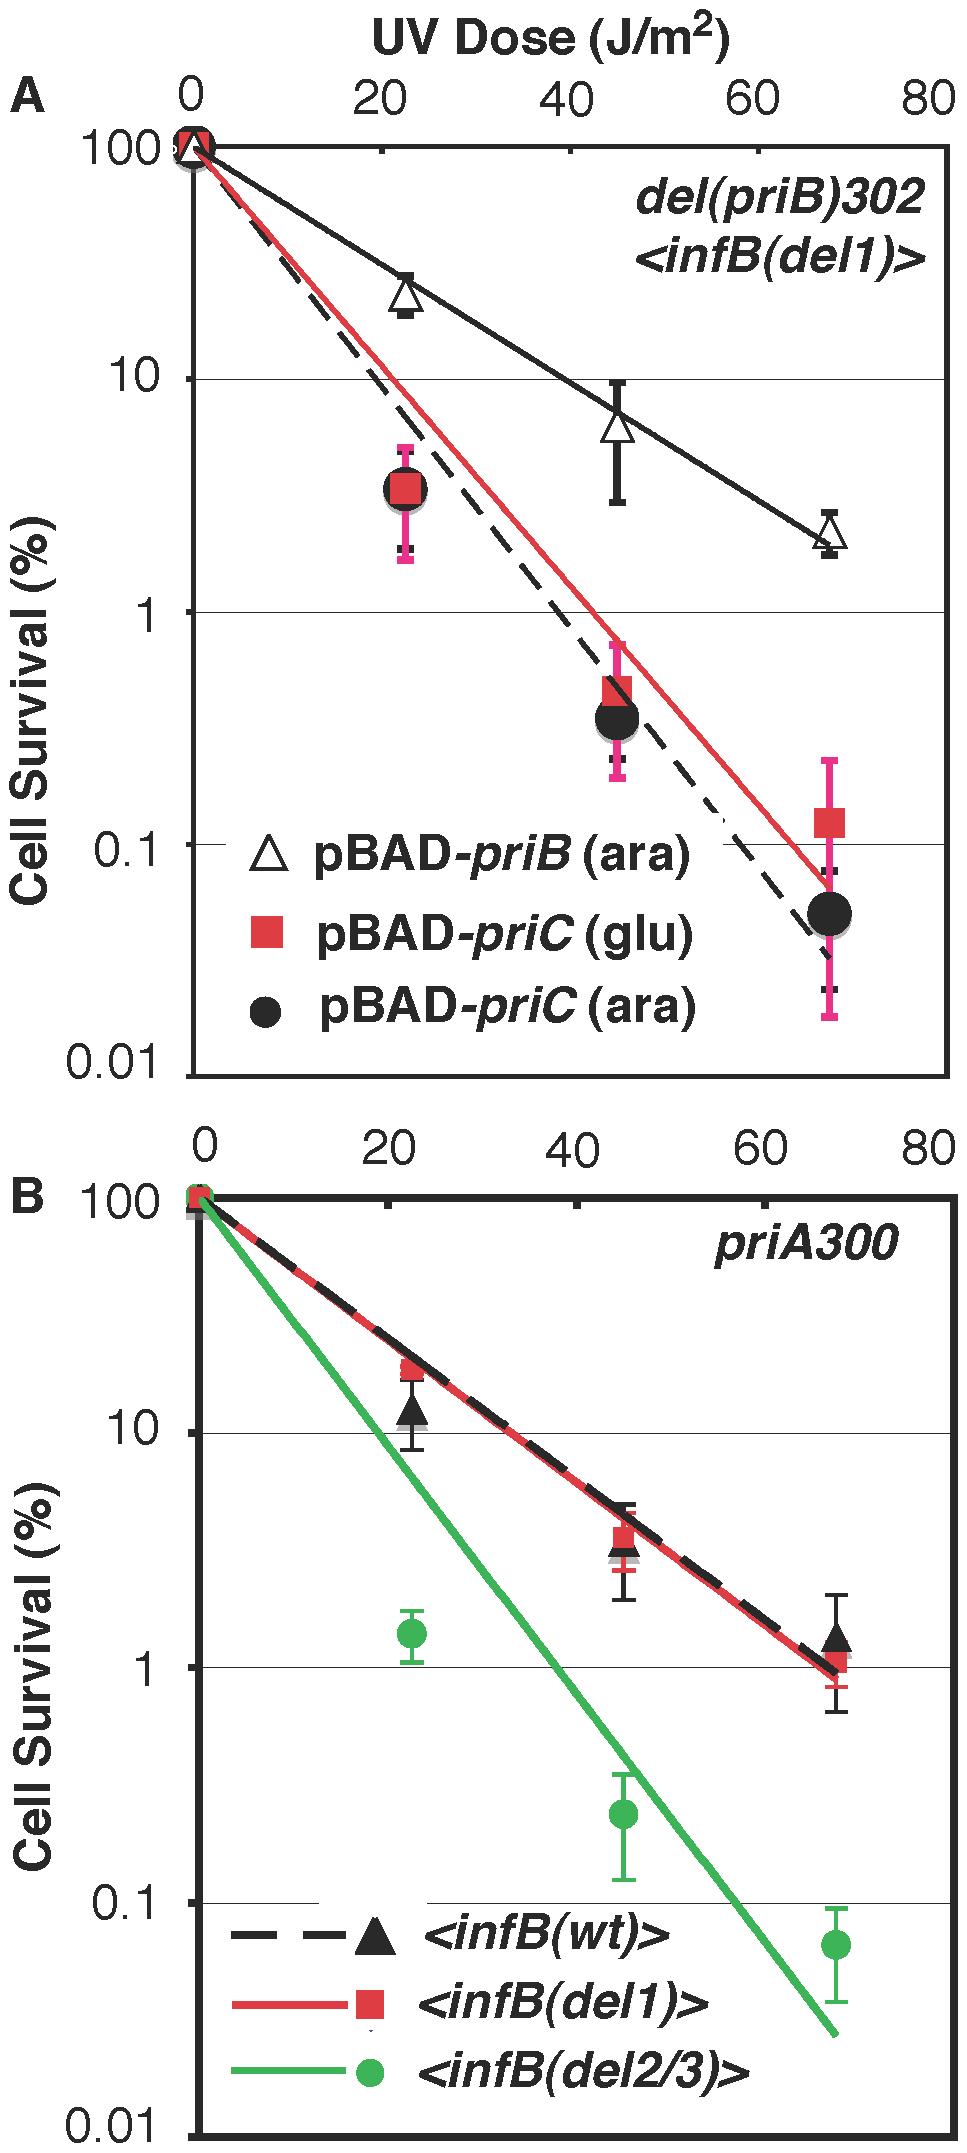 Epistasis analysis of <i>infB</i> alleles with <i>del(priB)302</i> and <i>priA300</i>.